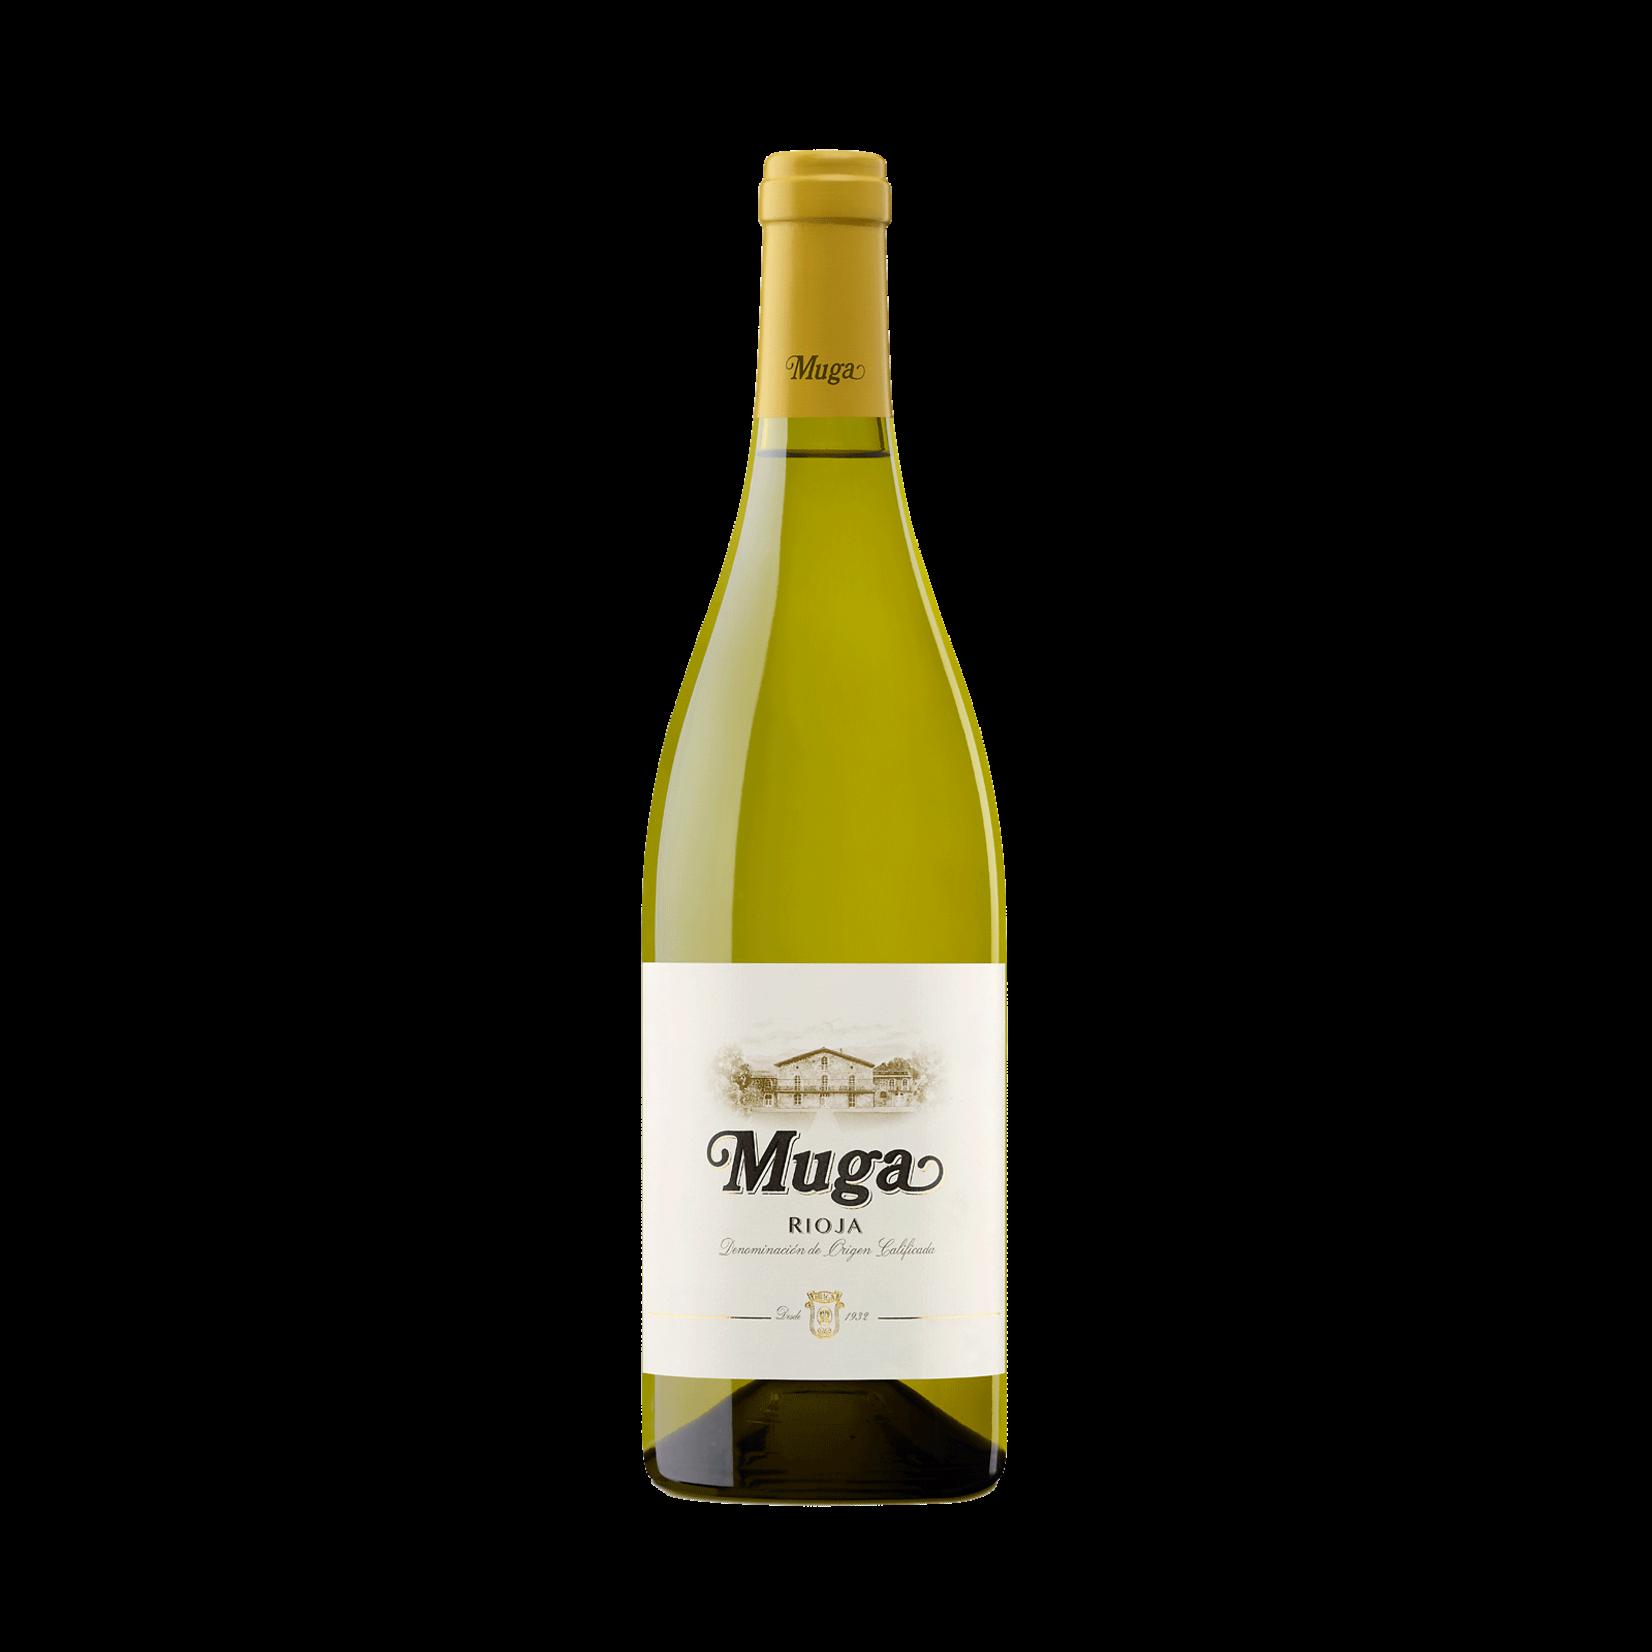 Wine Bodegas Muga Rioja Blanco White 2020